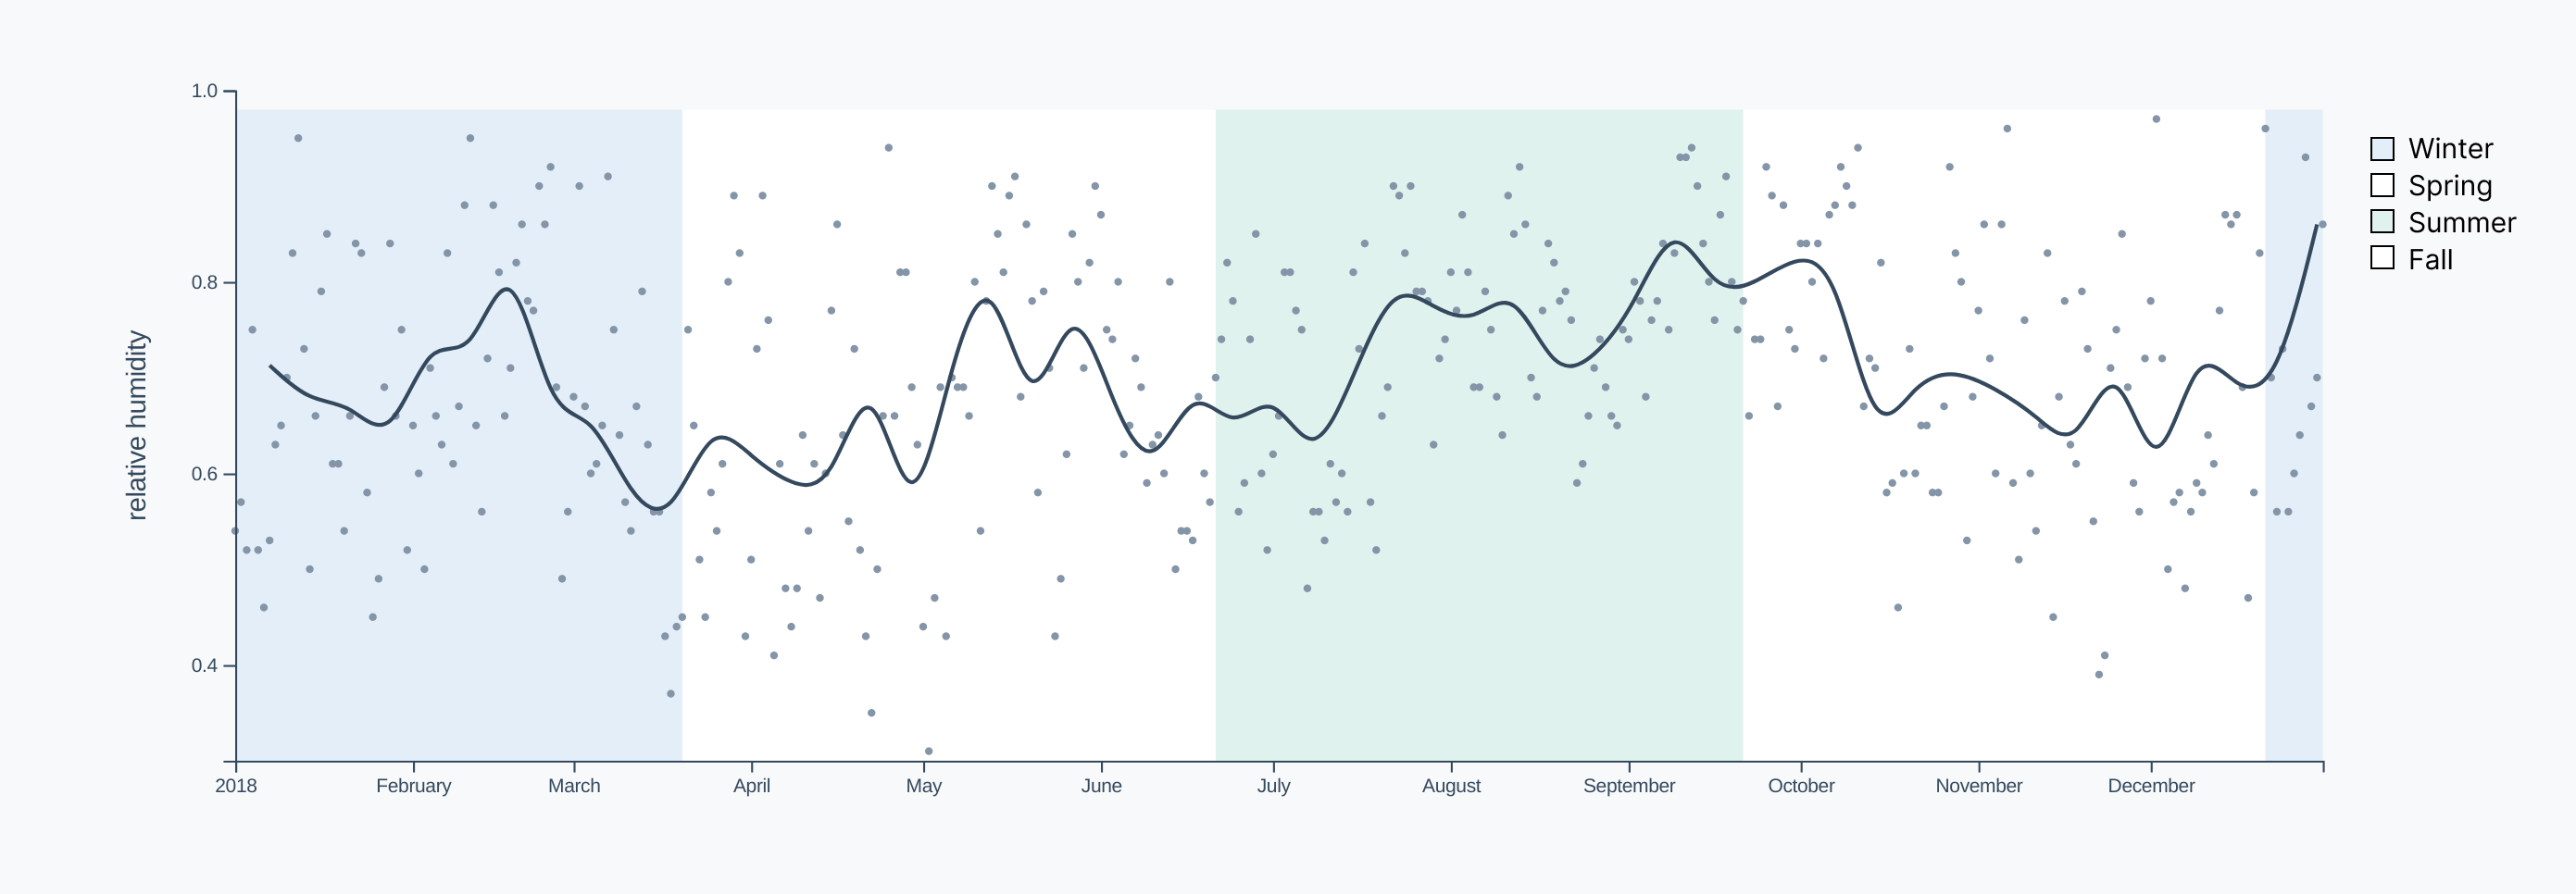 Humidity timeline, with seasons